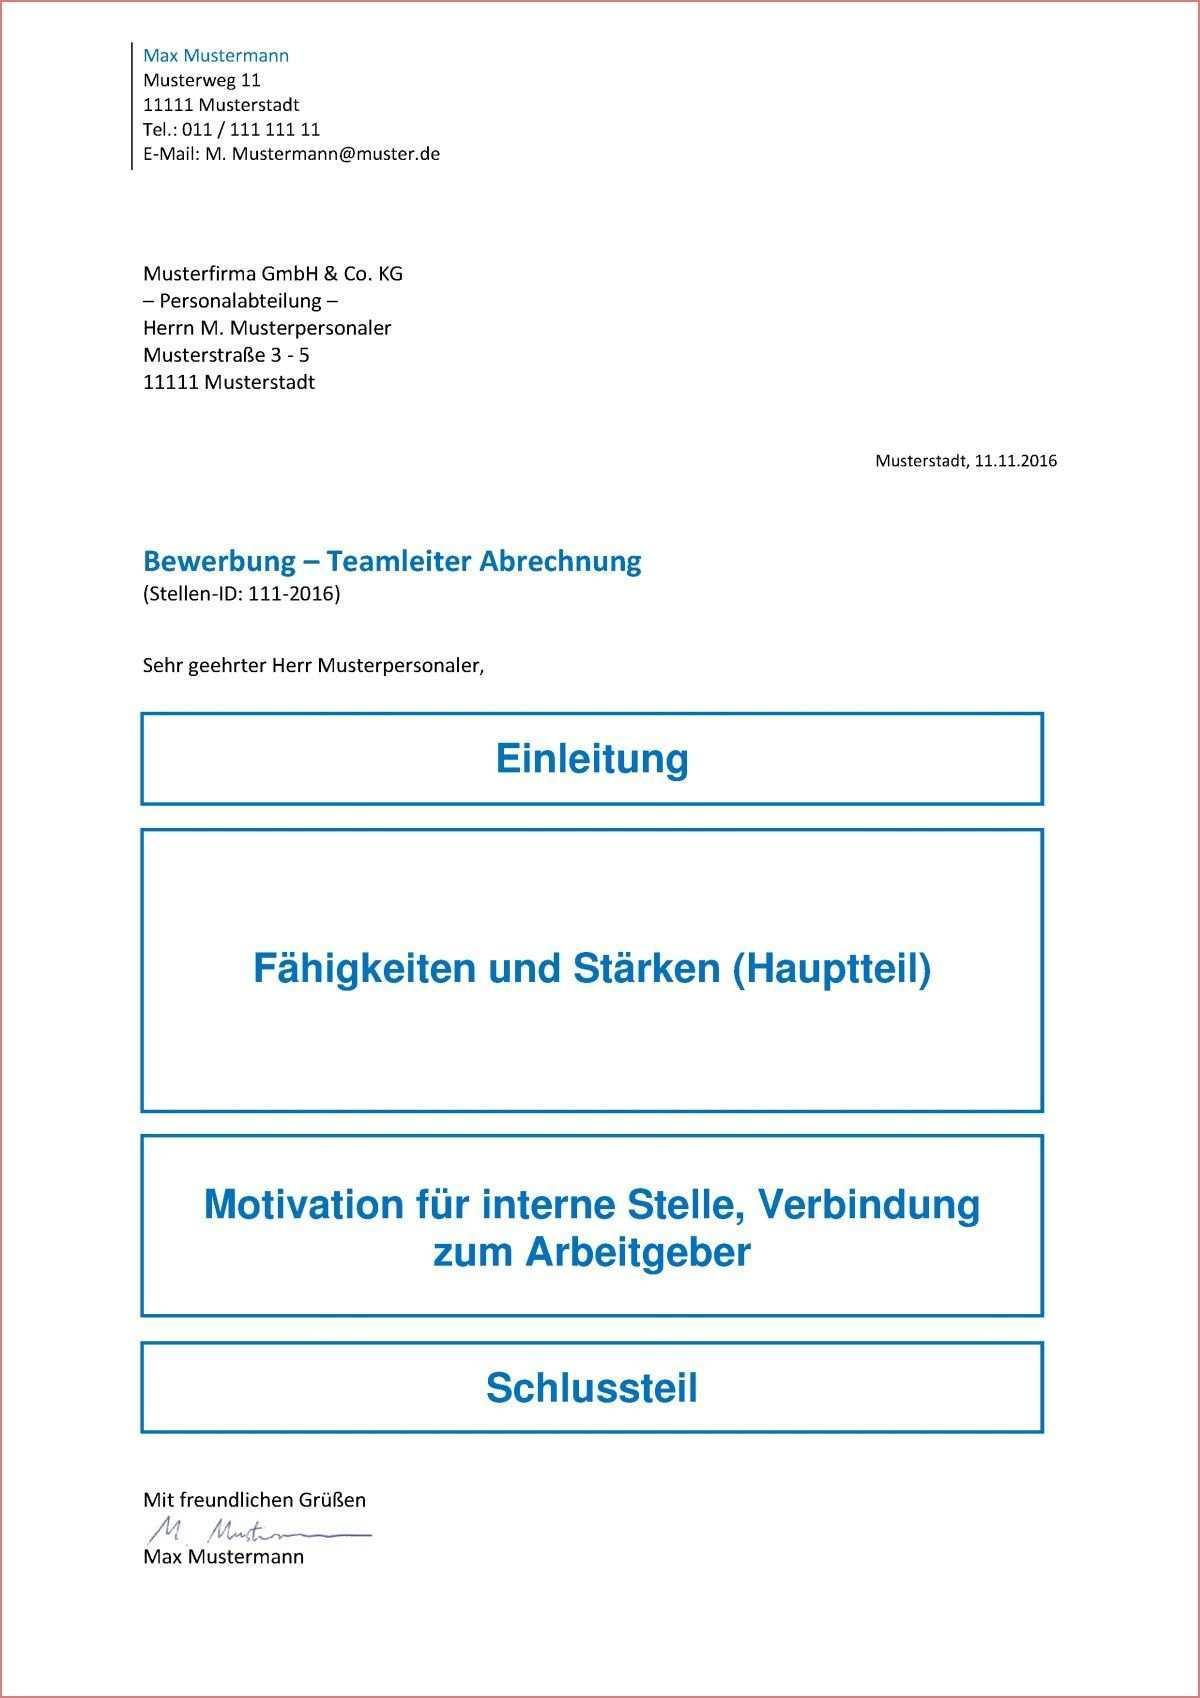 19 Positiv Interne Bewerbung Lebenslauf Stock Document Templates Templates Christmas Humor